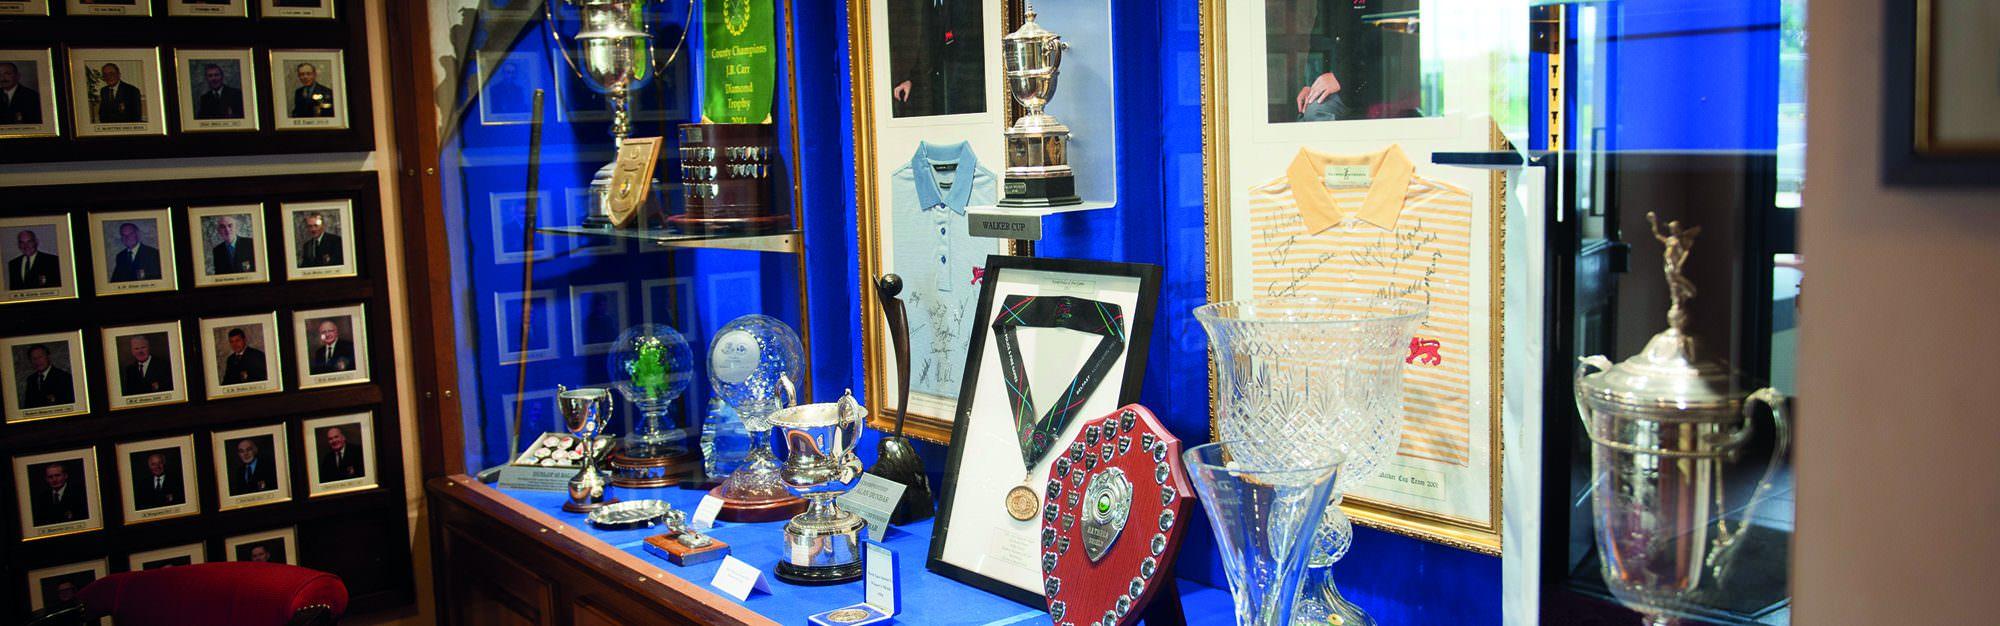 Tales of Royal Portrush: Rathmore Golf Club